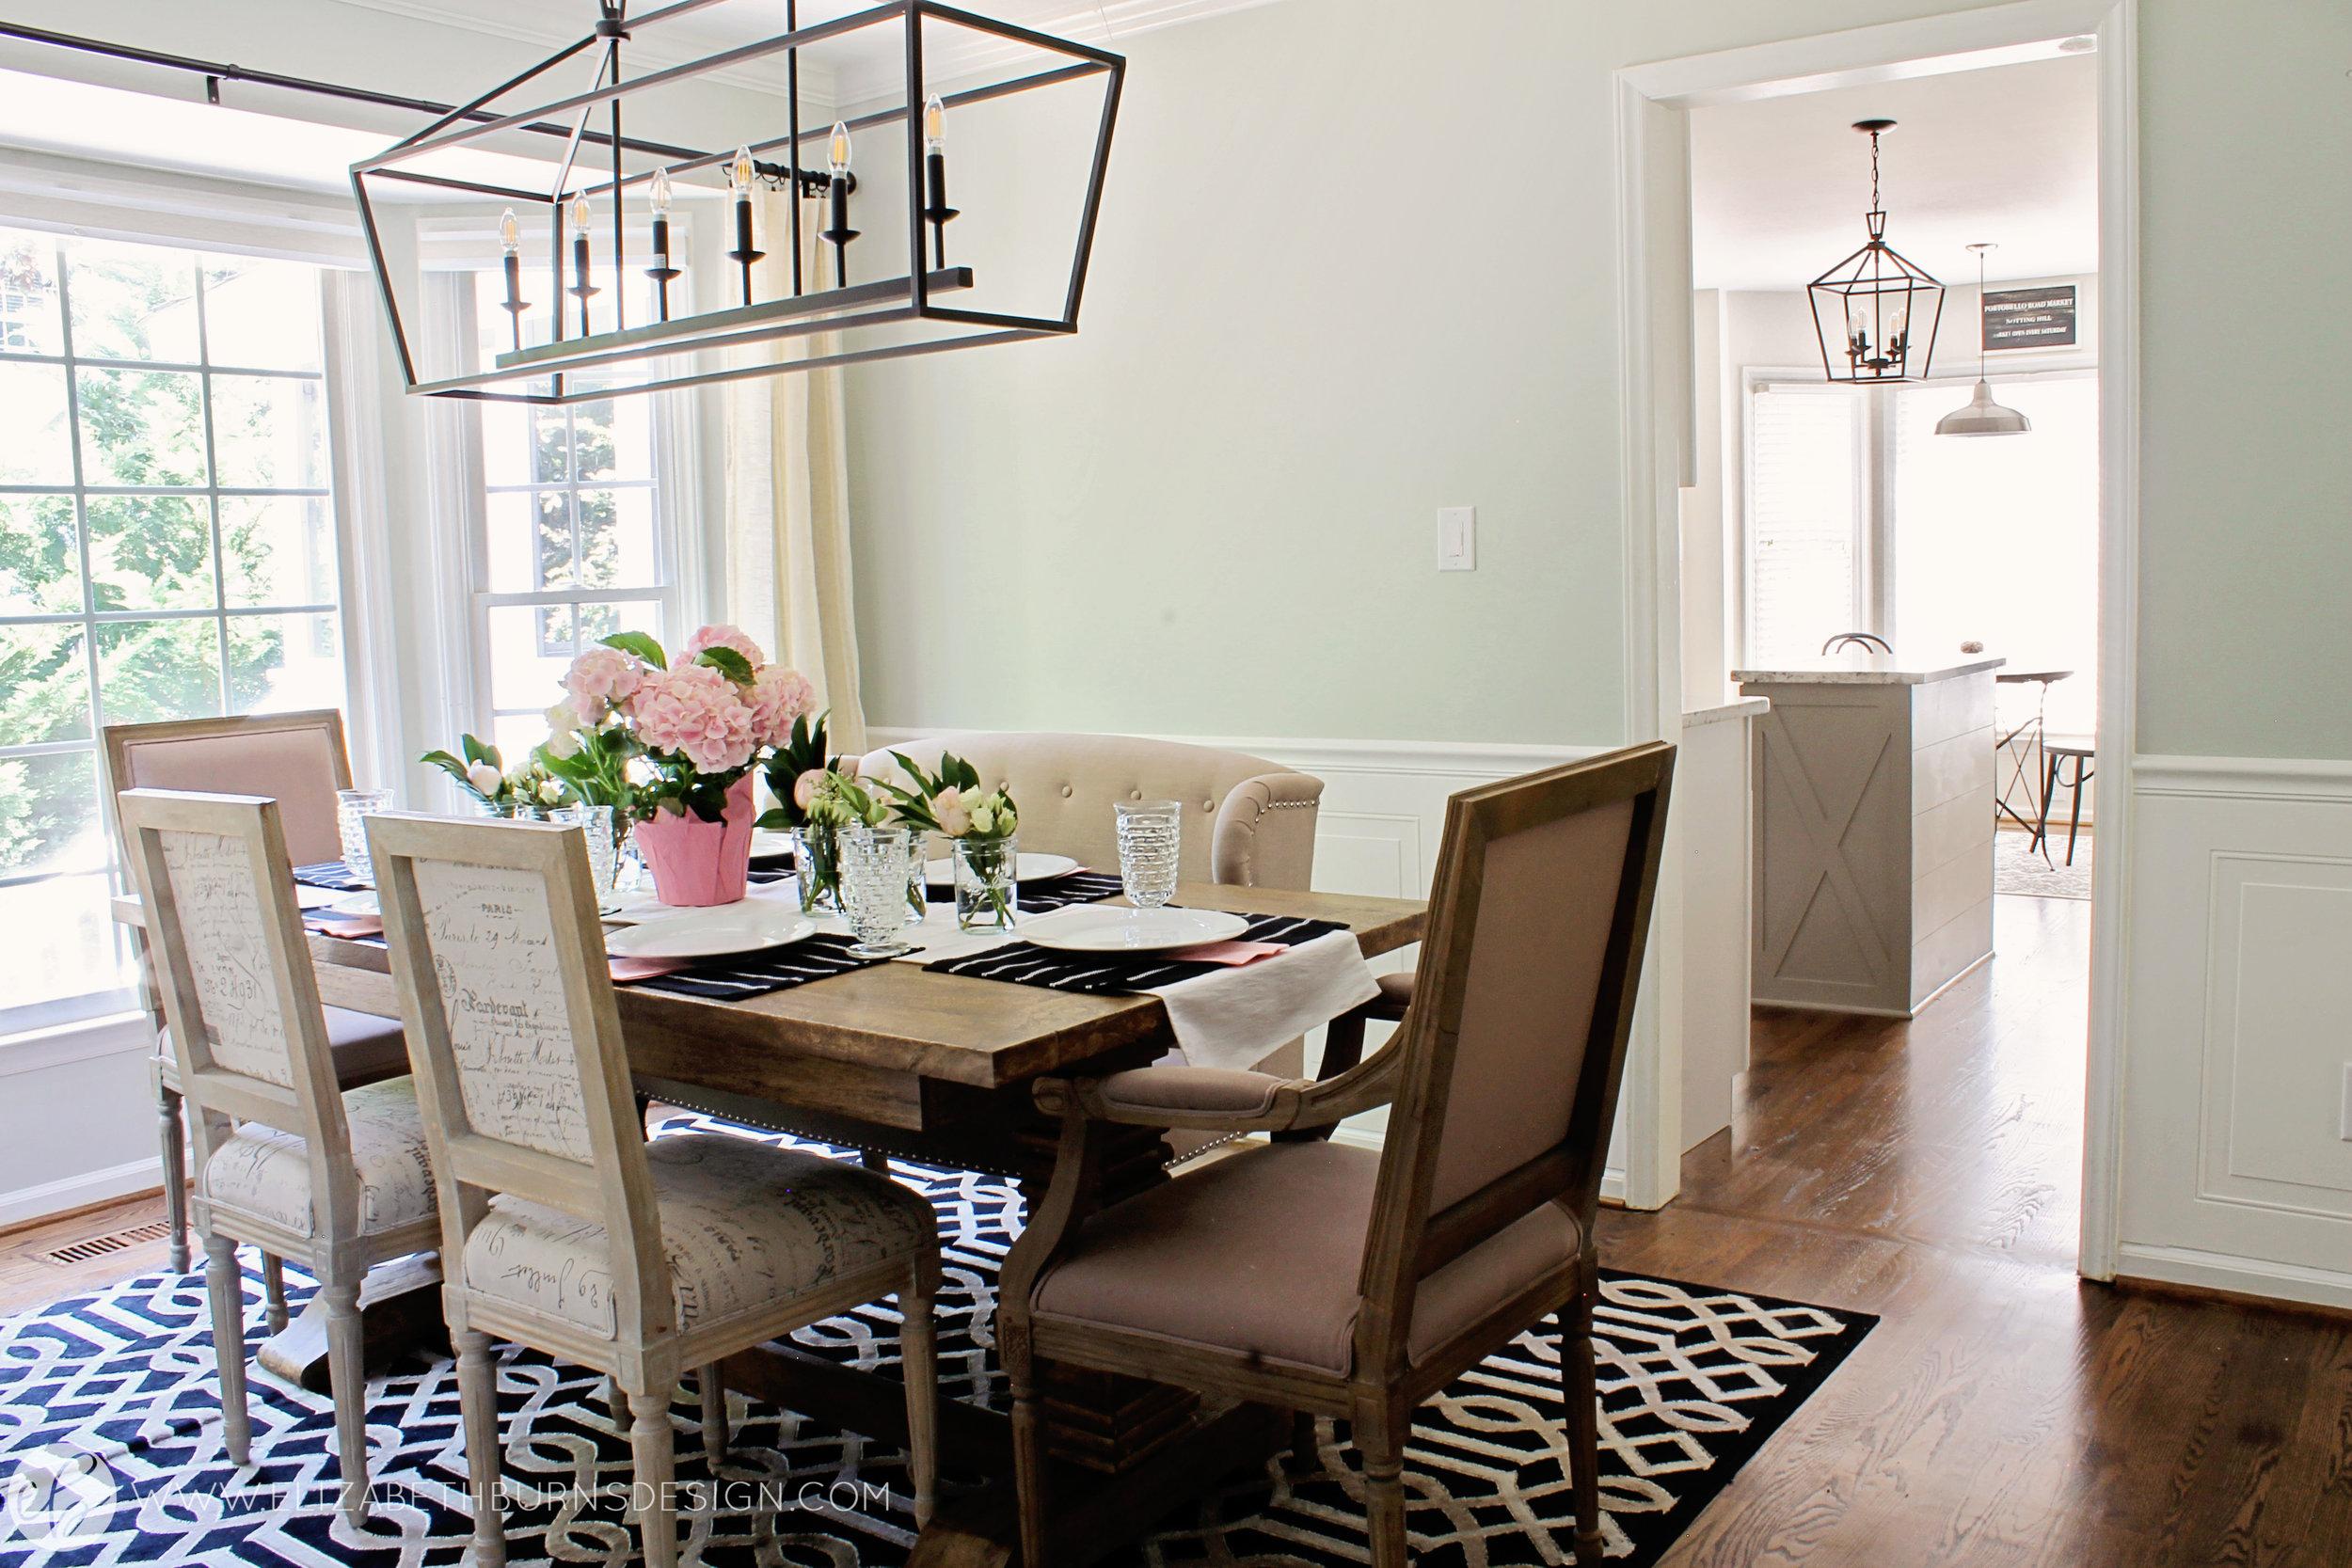 Elizabeth Burns Design - Budget Farmhouse Small Dining Room Sherwin Williams Silver Strand Trestle Table Linen Chairs DIY Wainscoting Dark Walnut Oak Floor (3).jpg